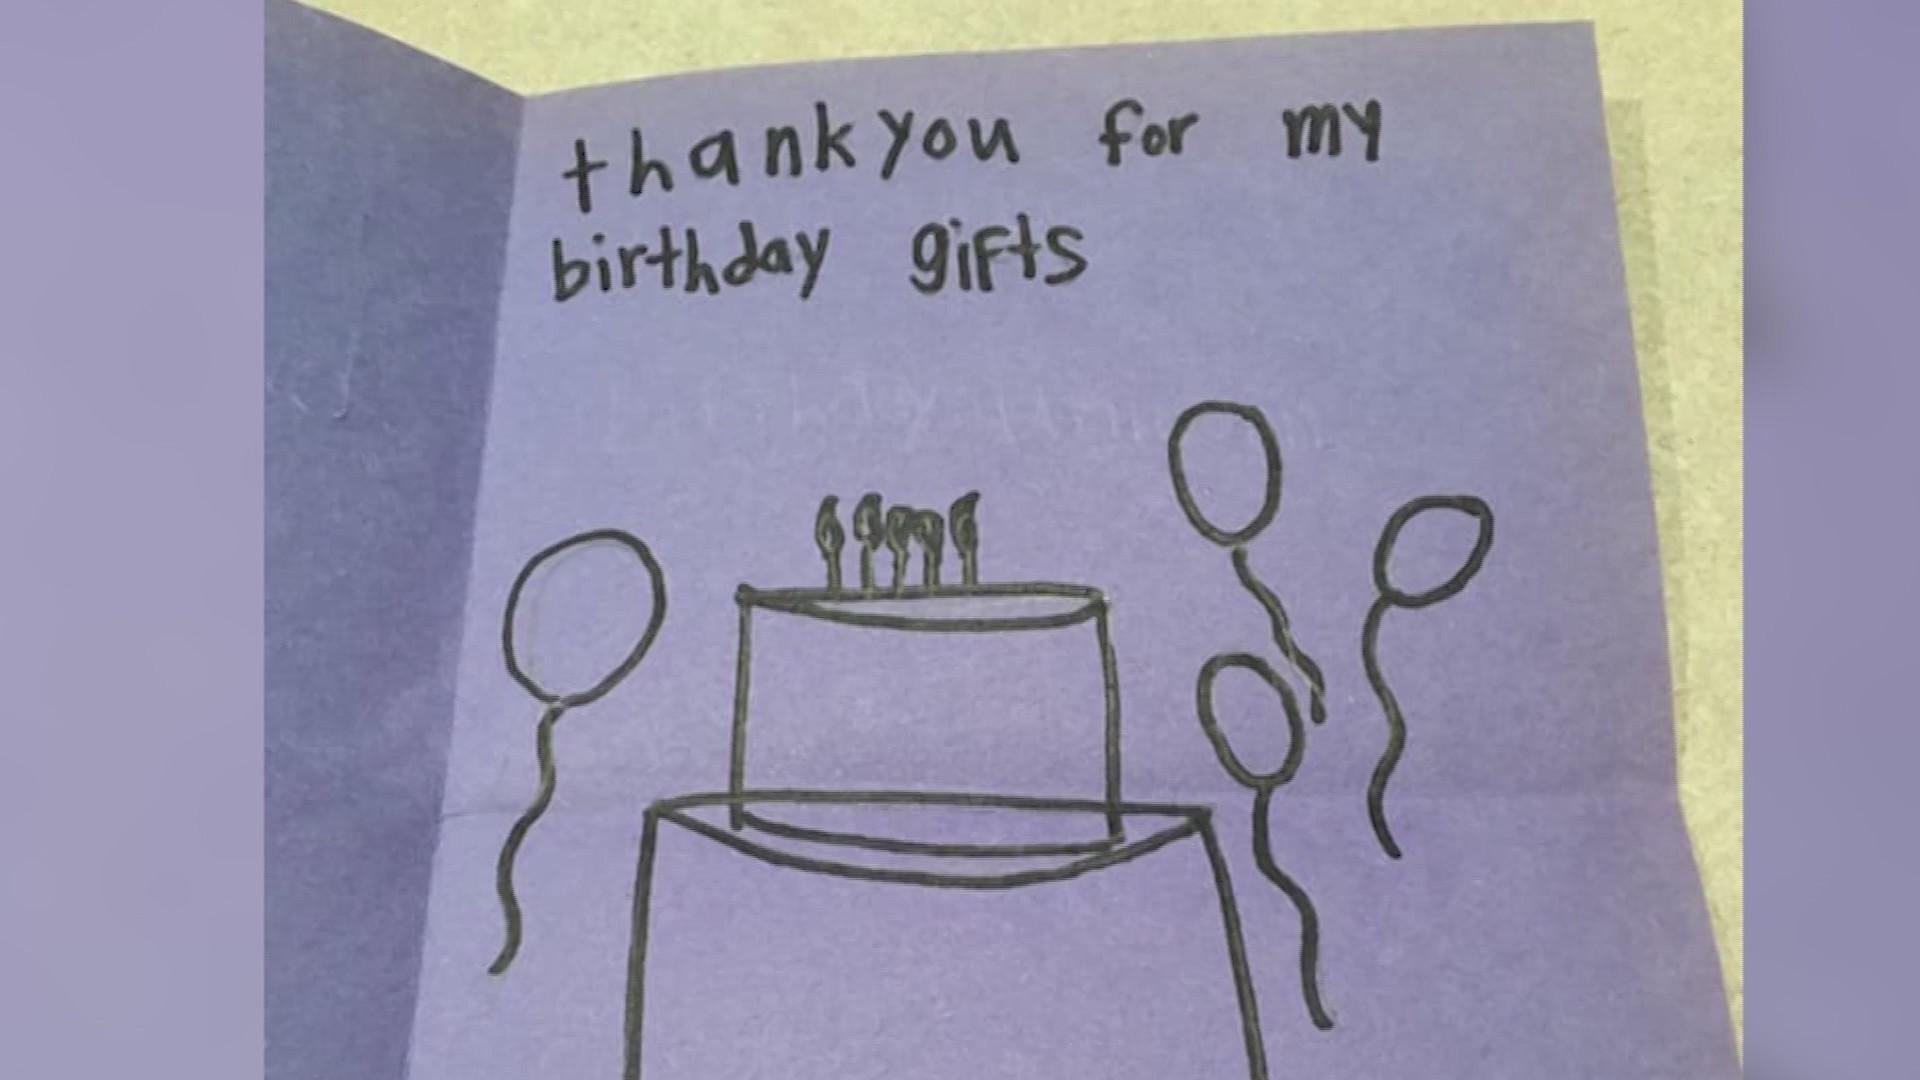 New_nonprofit_gives_birthday_gifts_to_ki_0_20190510032334-60044163